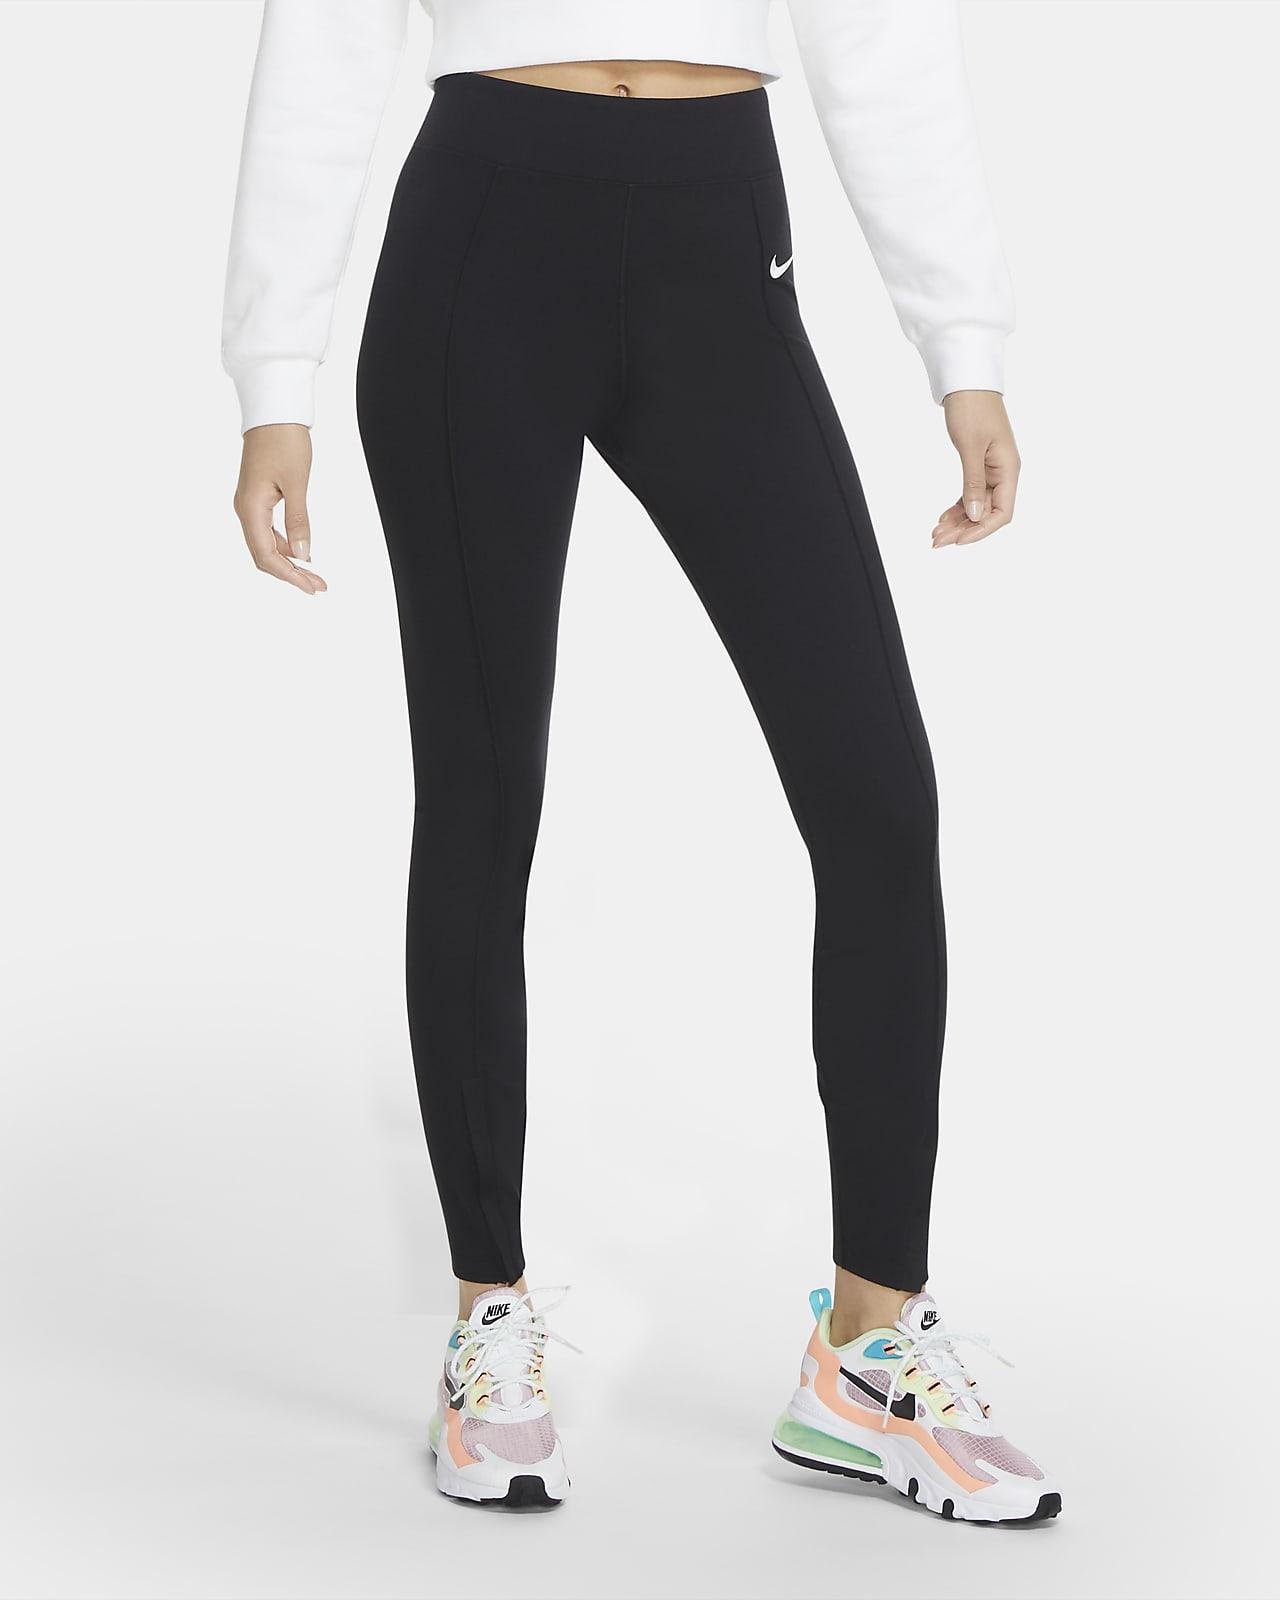 Legging Nike Sportswear Leg-A-See pour Femme